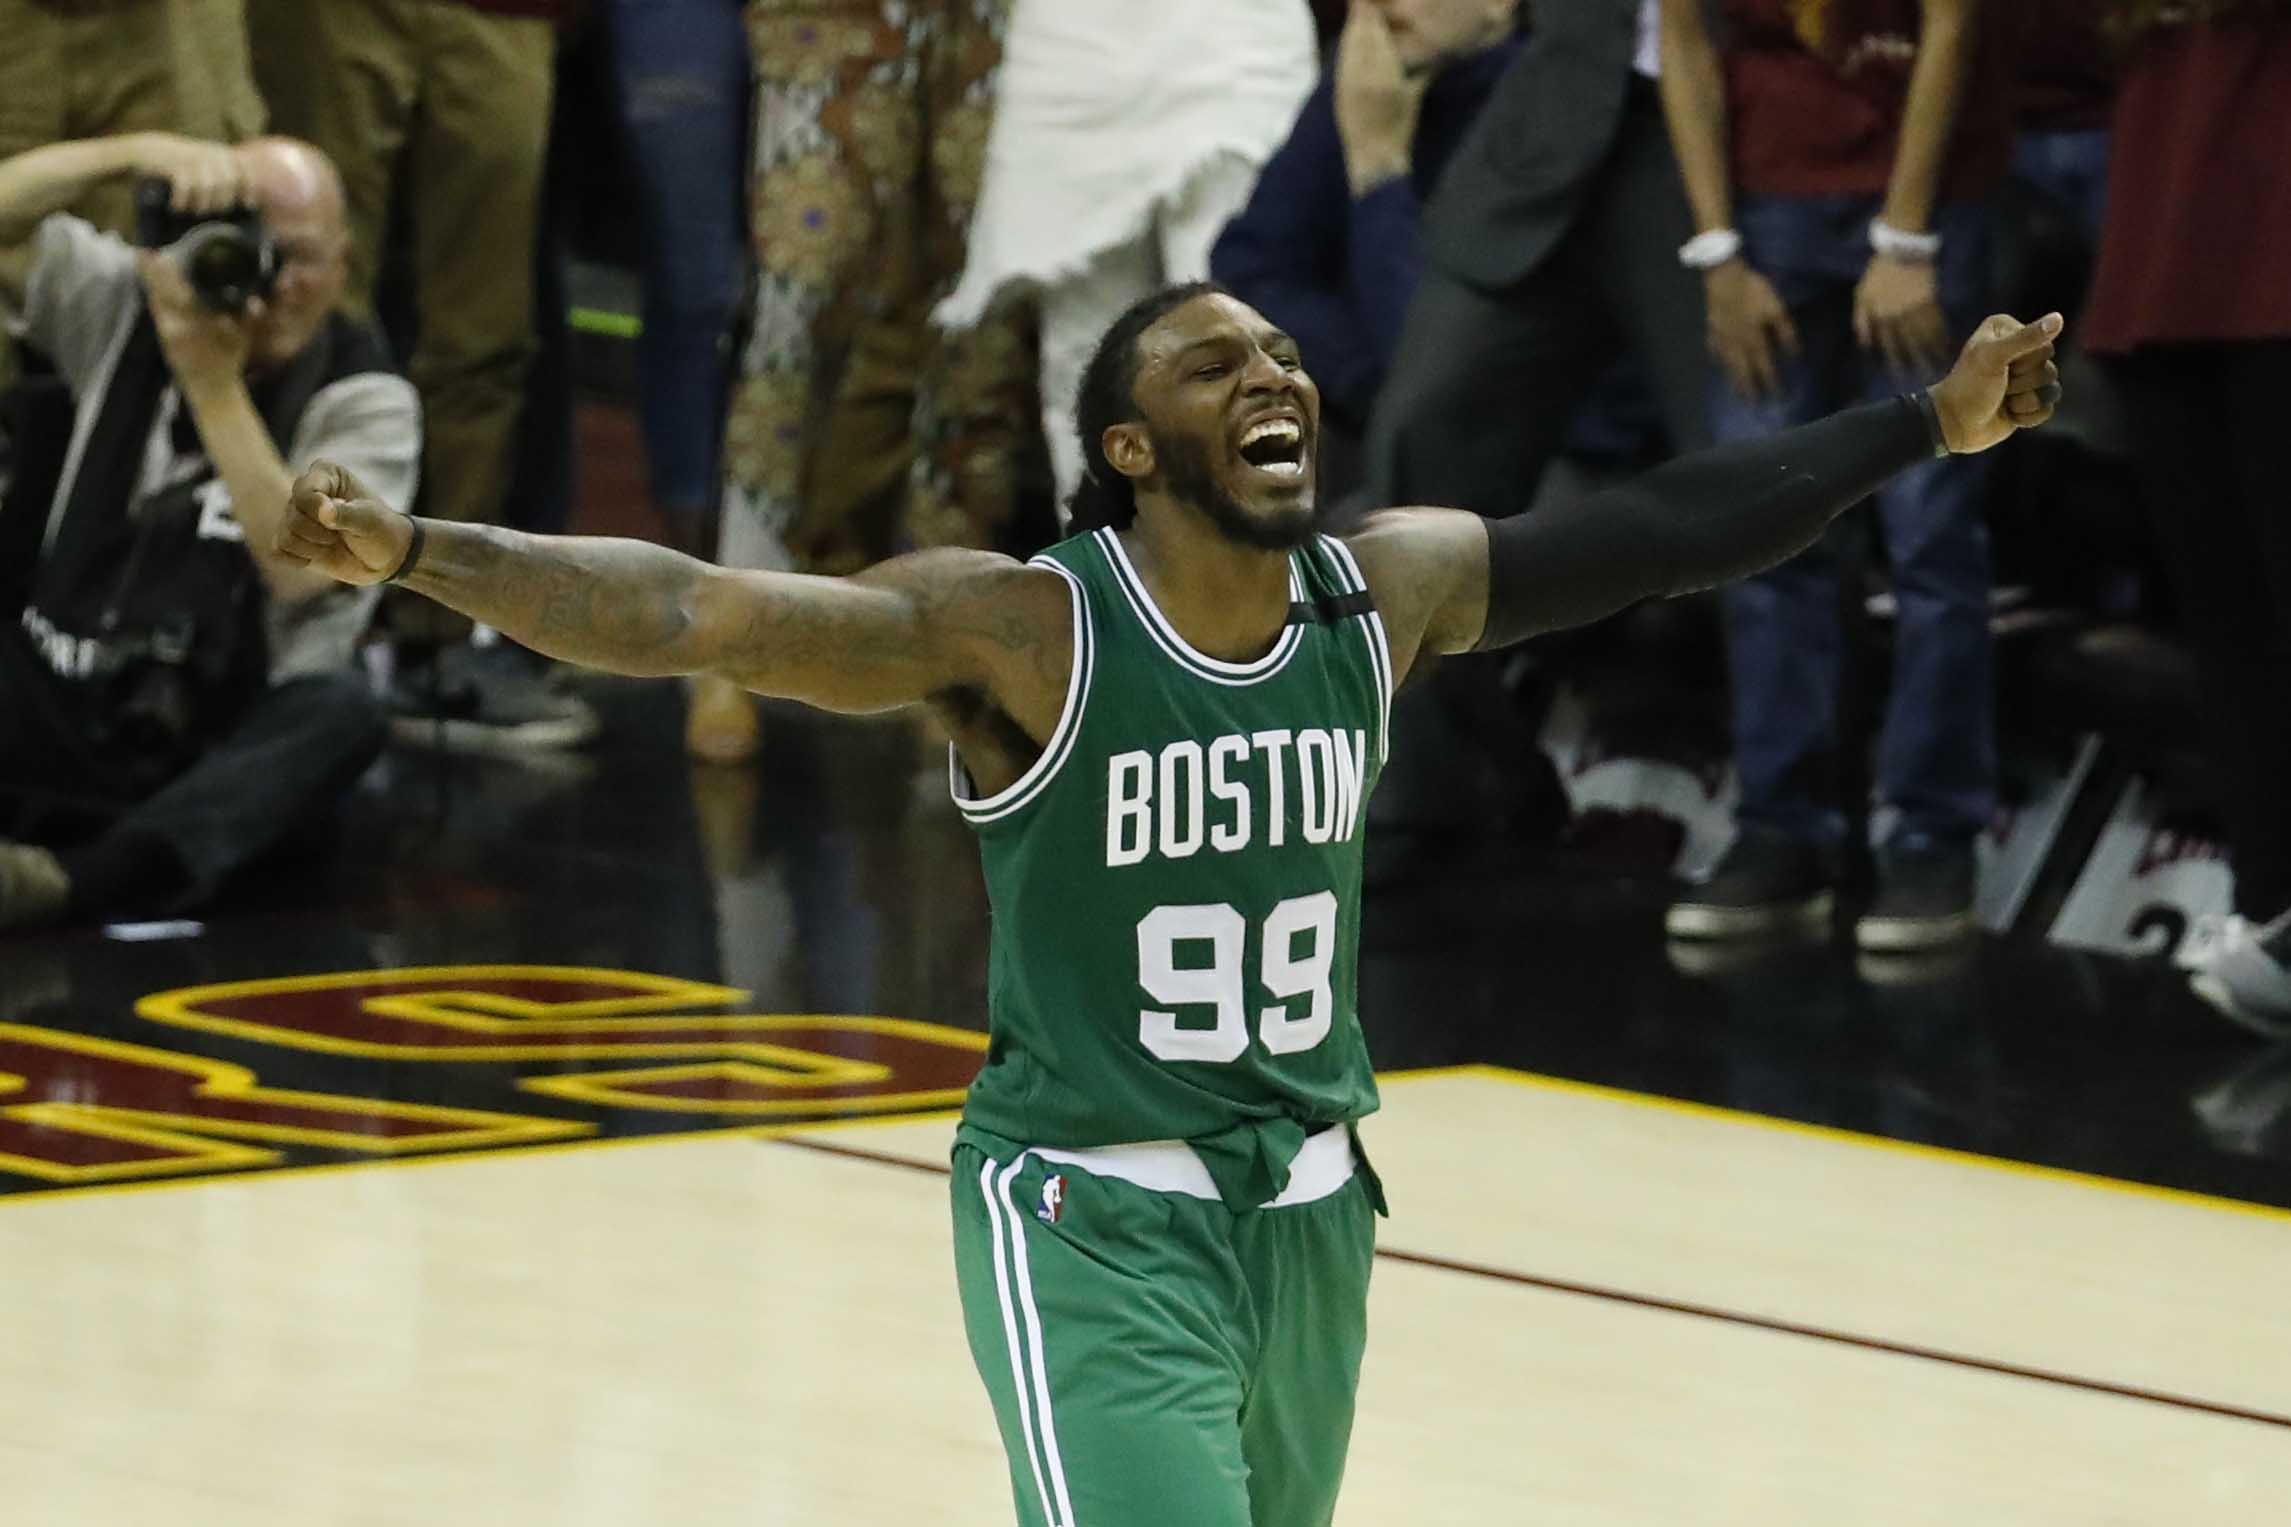 10069161-nba-playoffs-boston-celtics-at-cleveland-cavaliers